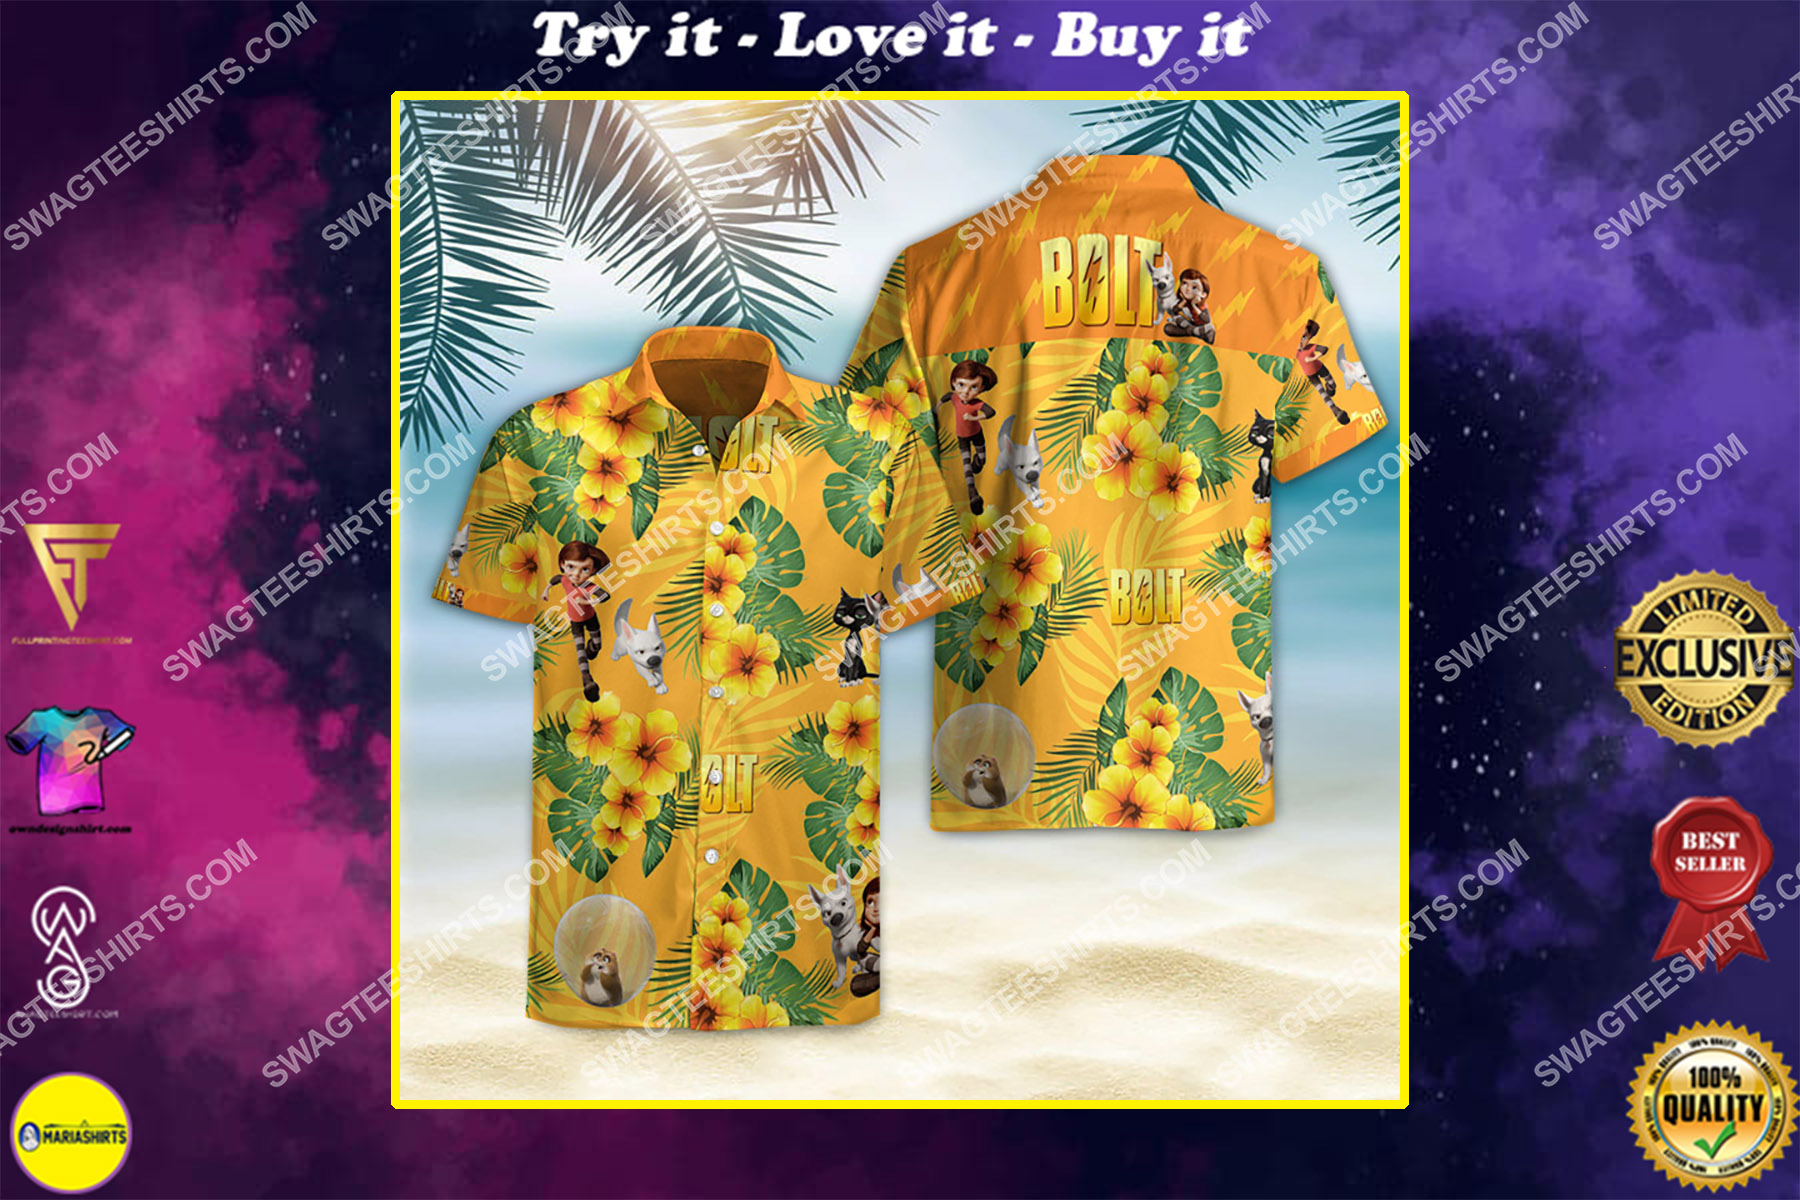 bolt movie all over printed hawaiian shirt